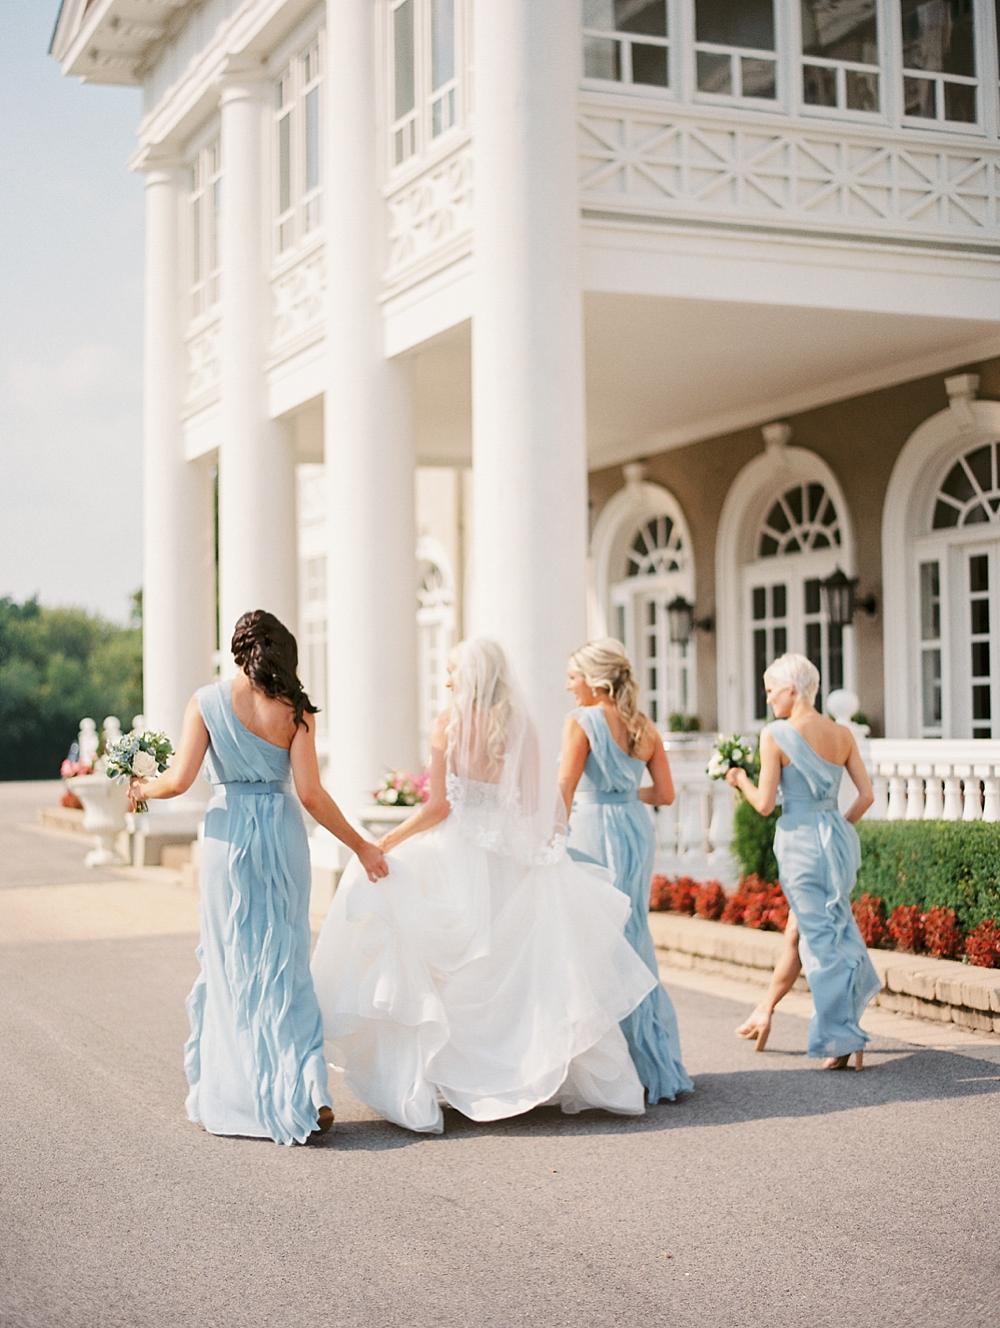 kristin-la-voie-photography-lehmann-mansion-wedding-photographer-175